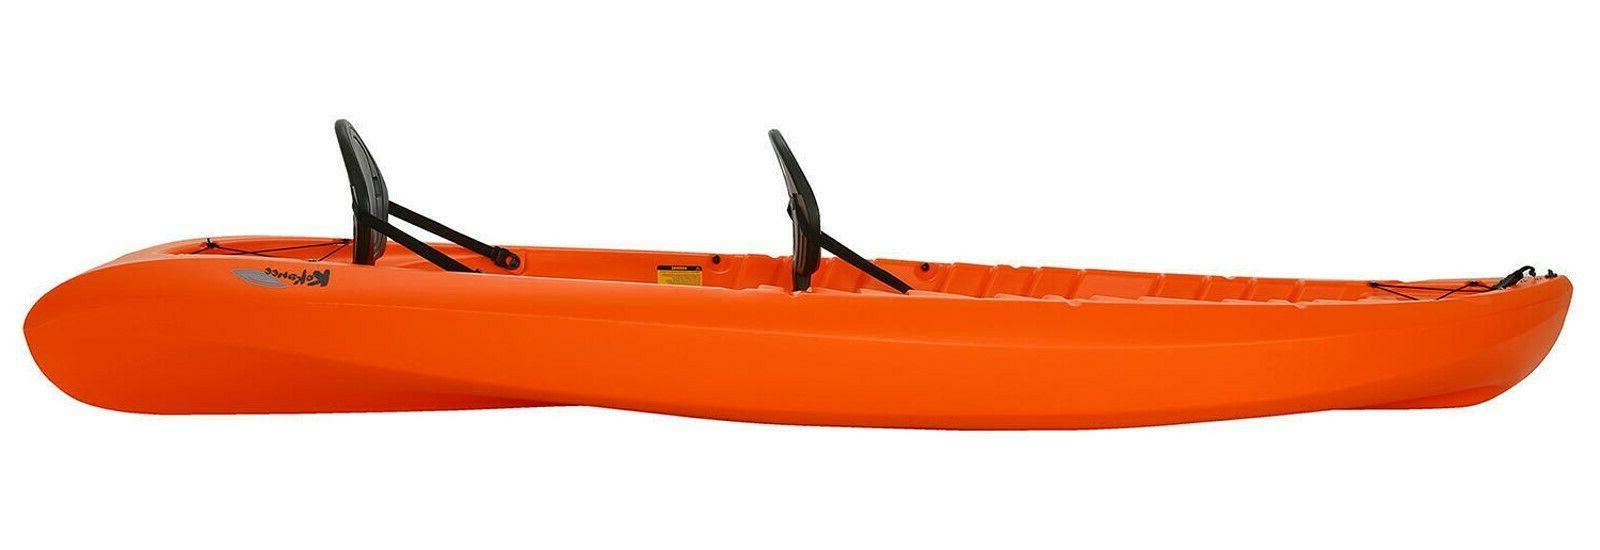 2 Person Kayak Two Sit Seats HDPE